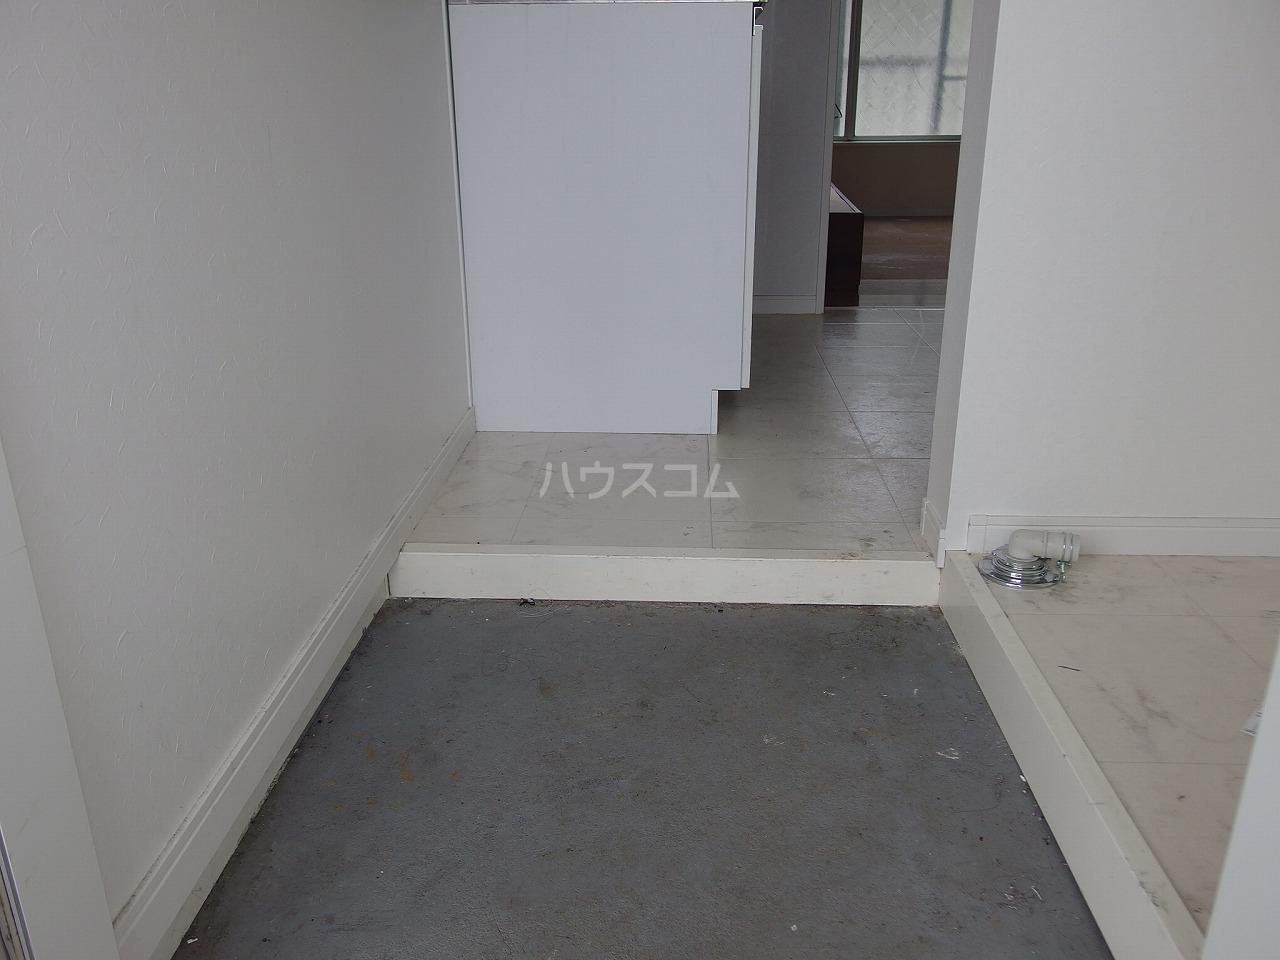 第1白王荘 102号室の玄関